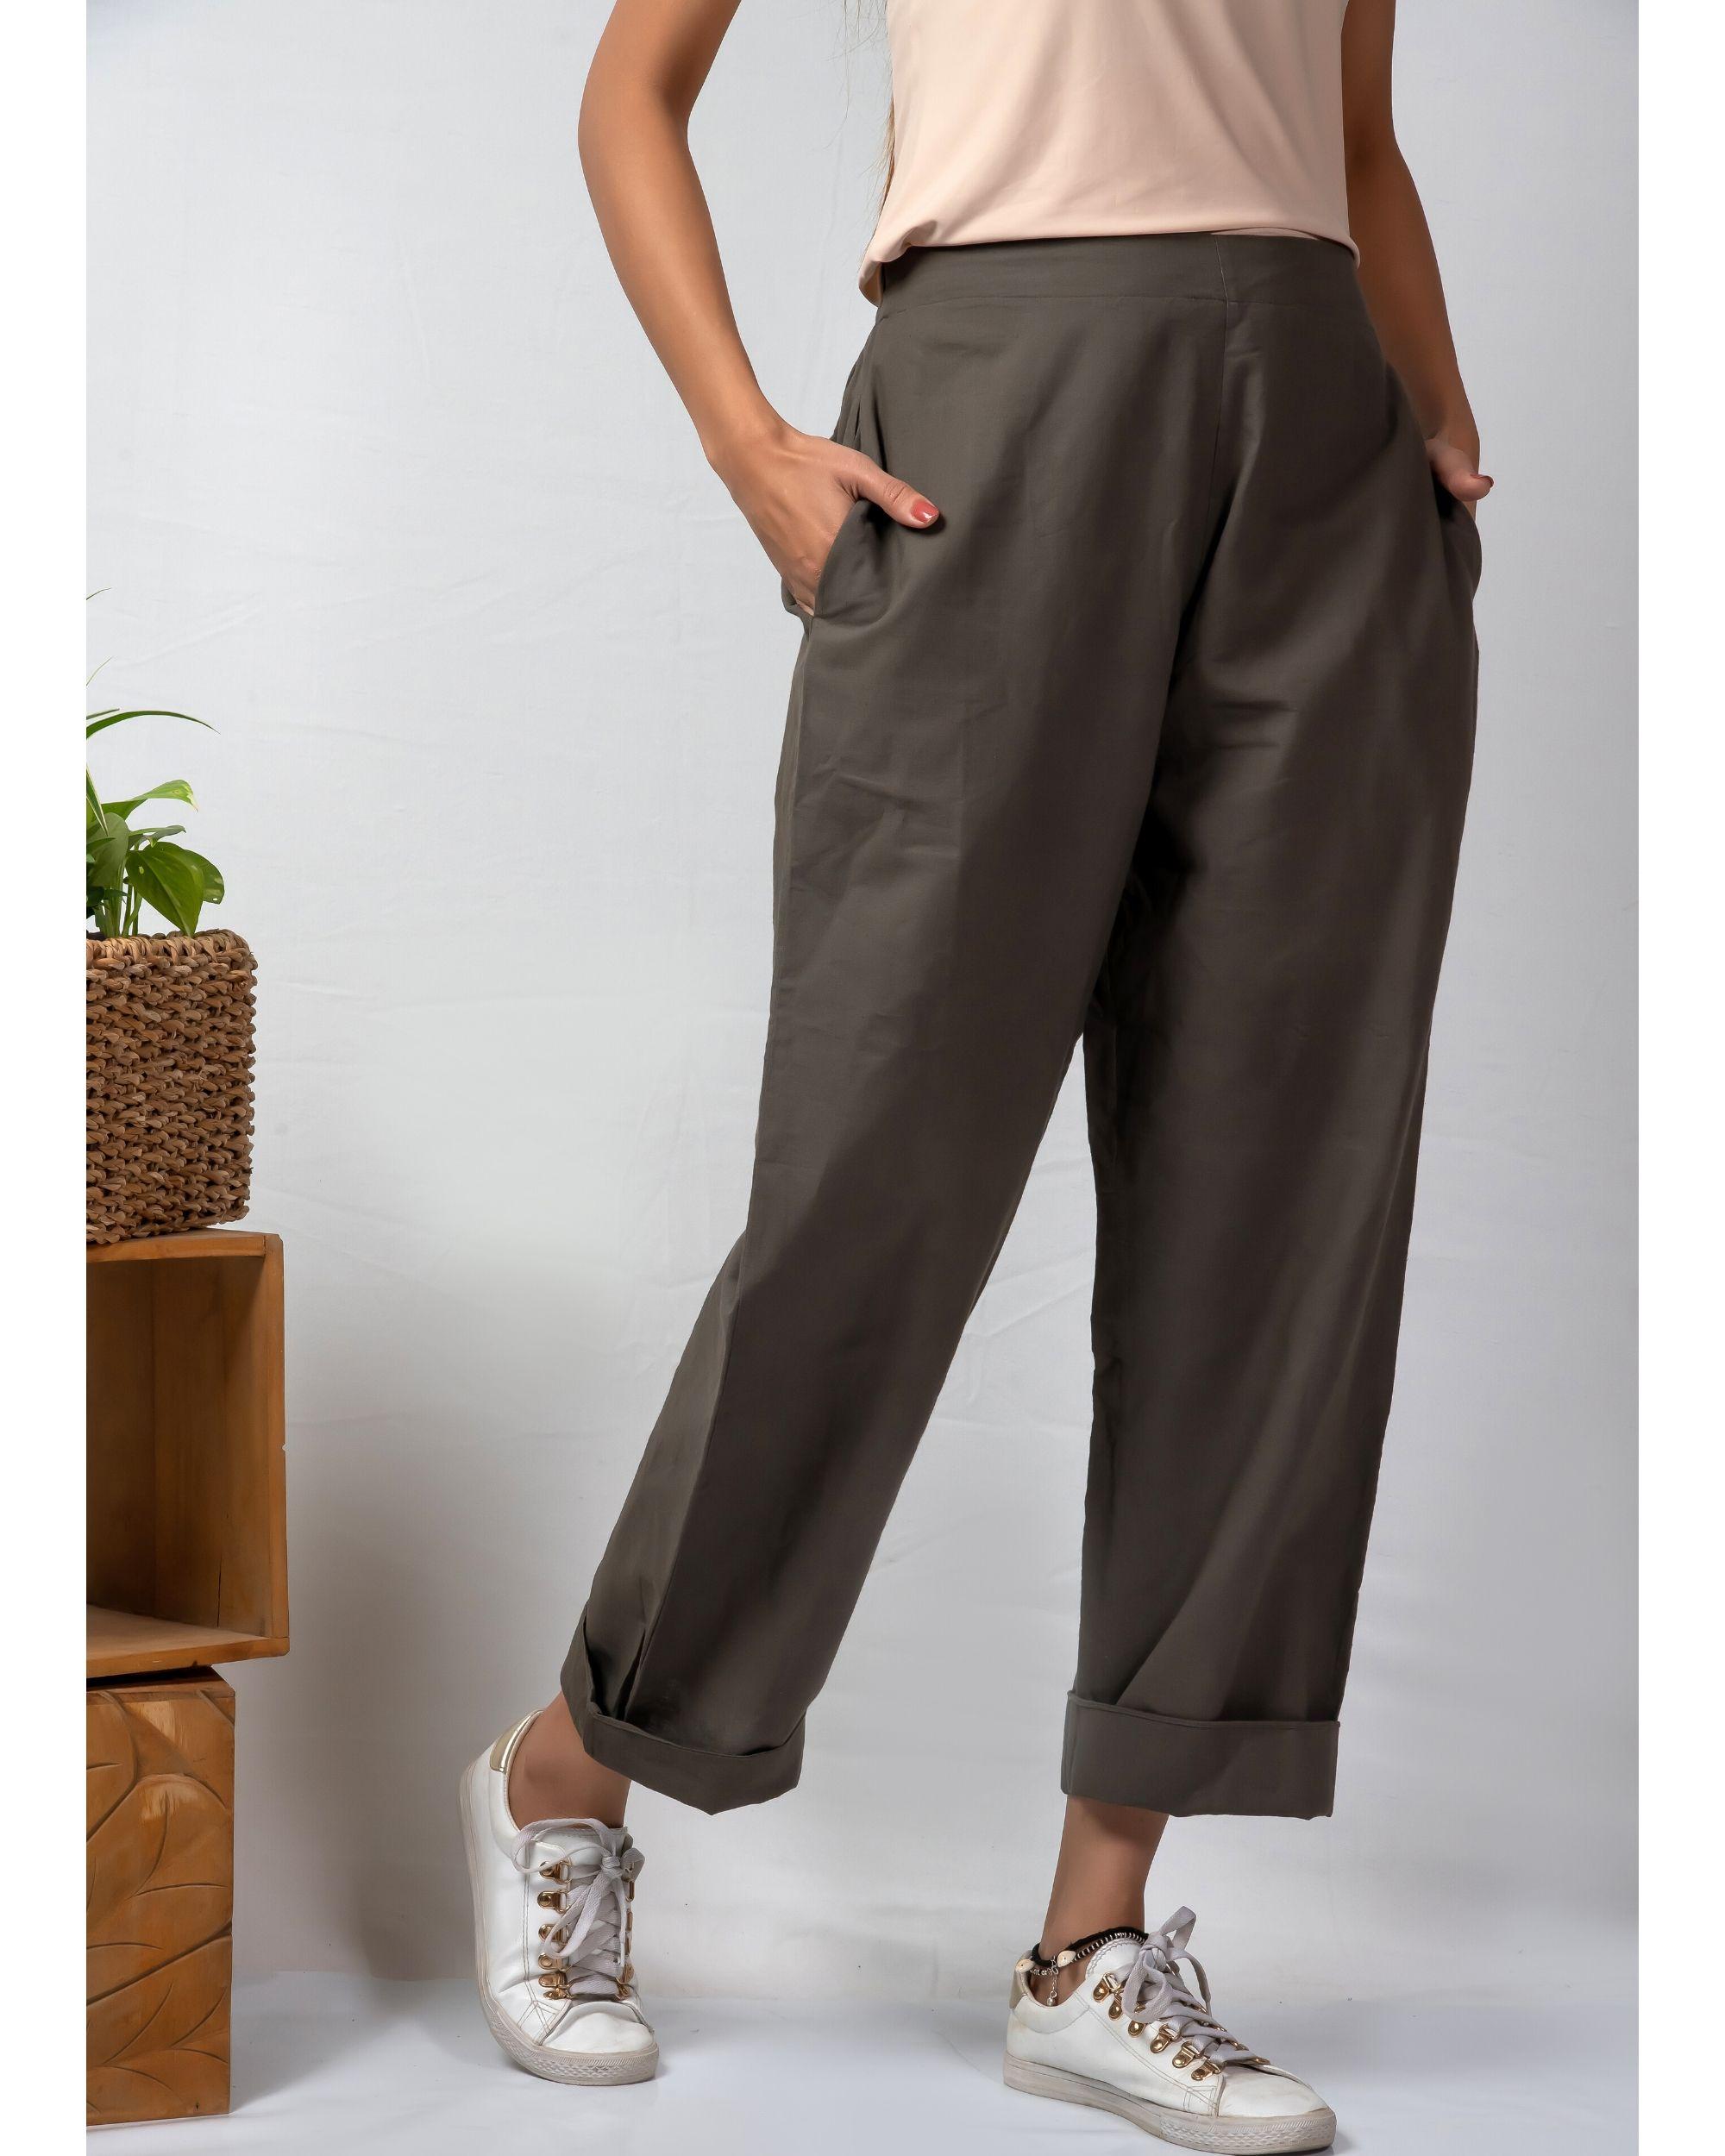 Grey rolled hem cotton pants